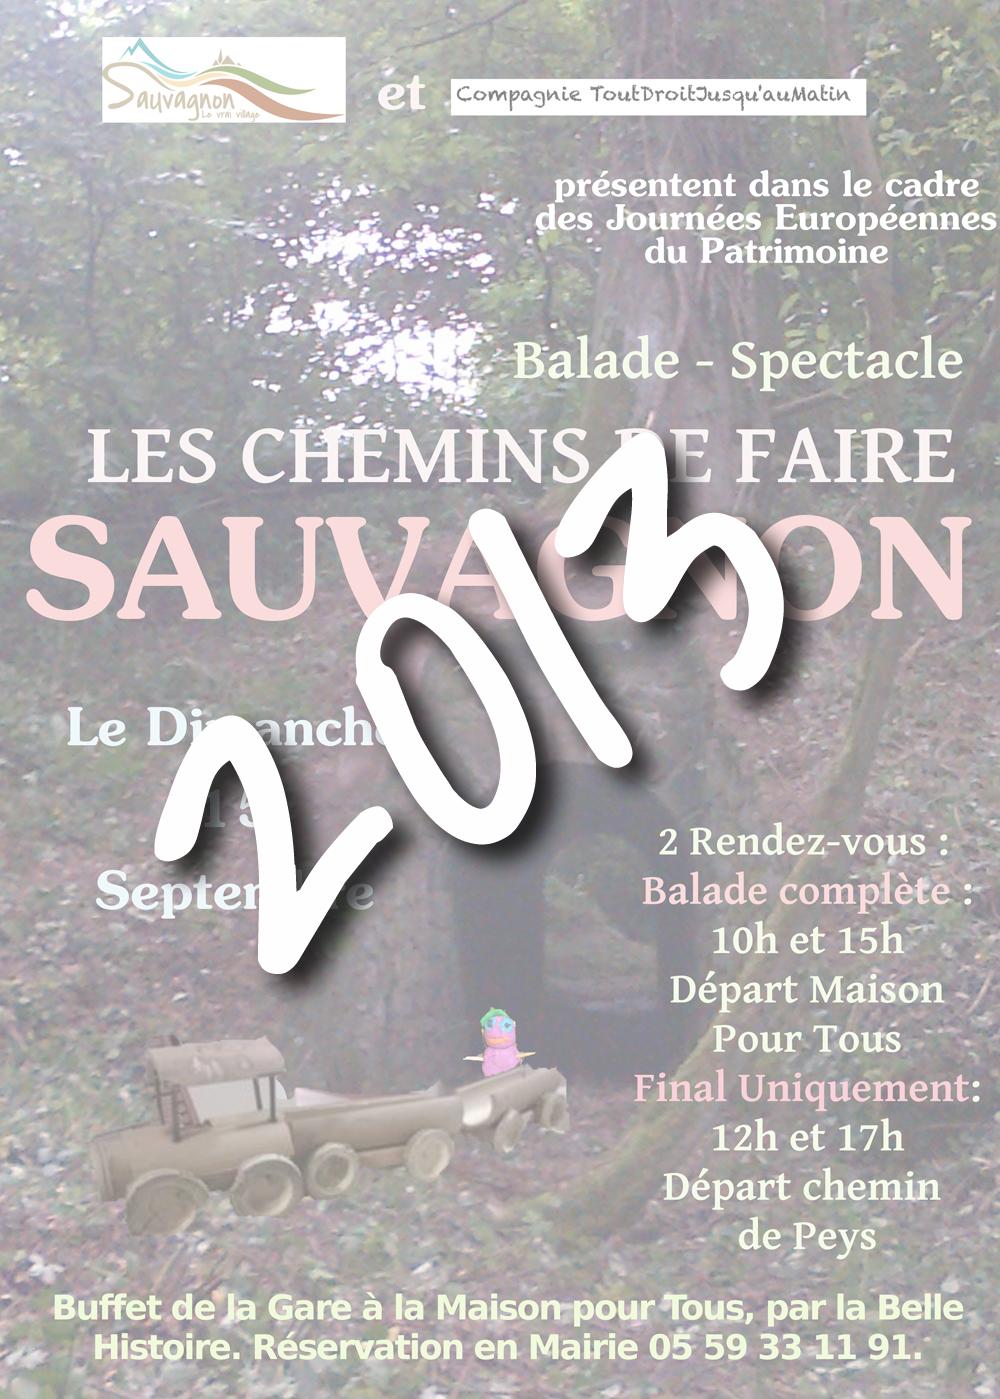 Sauvagnon patrimoine 2013